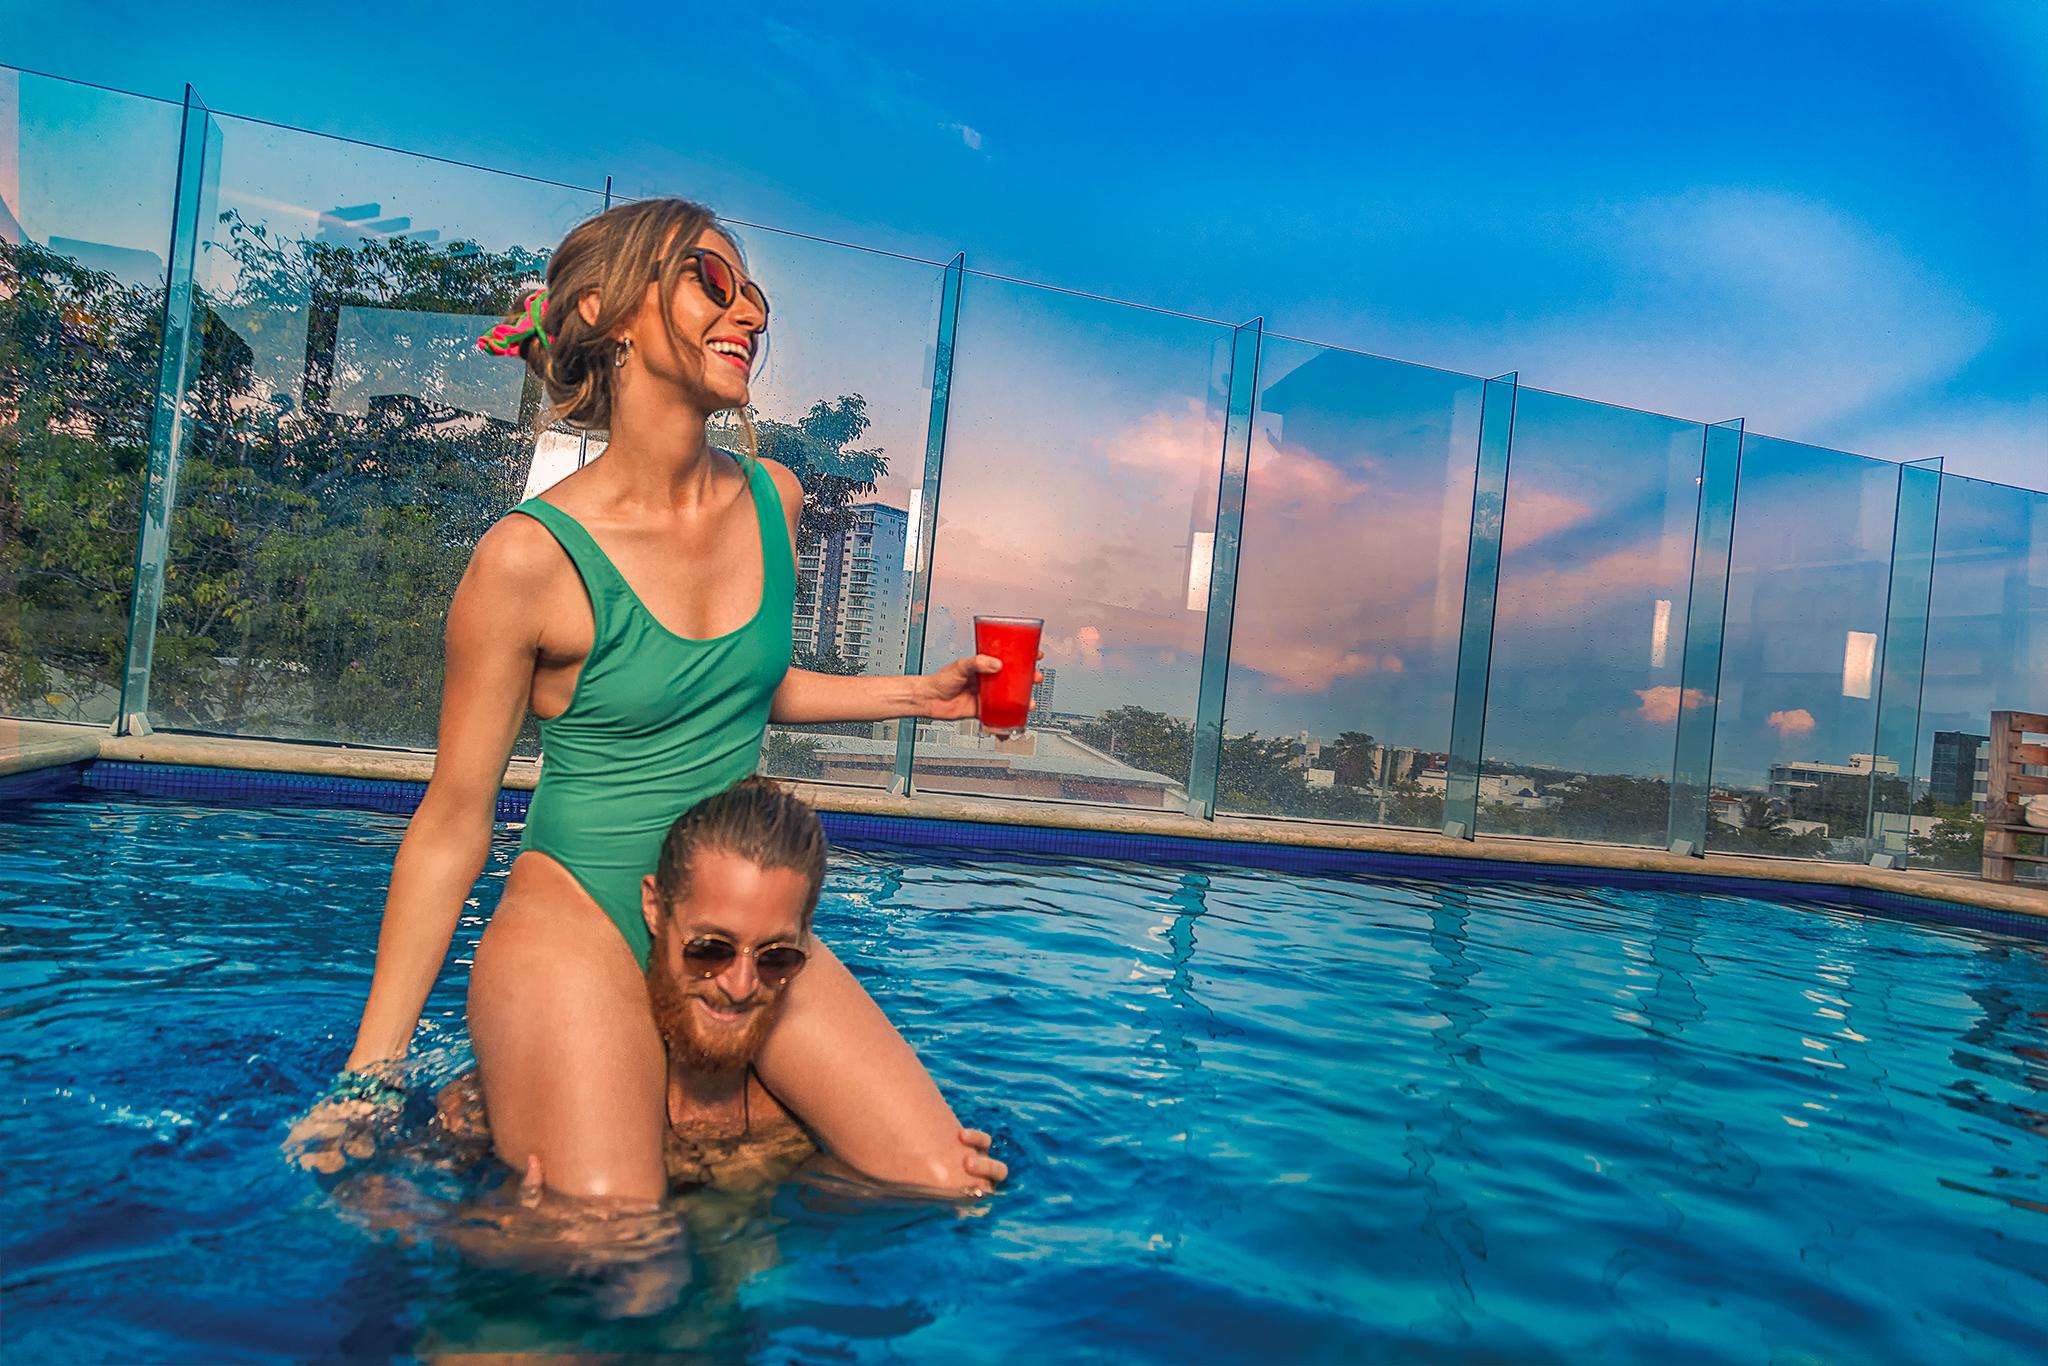 Nomads Hostel & Bar Cancun